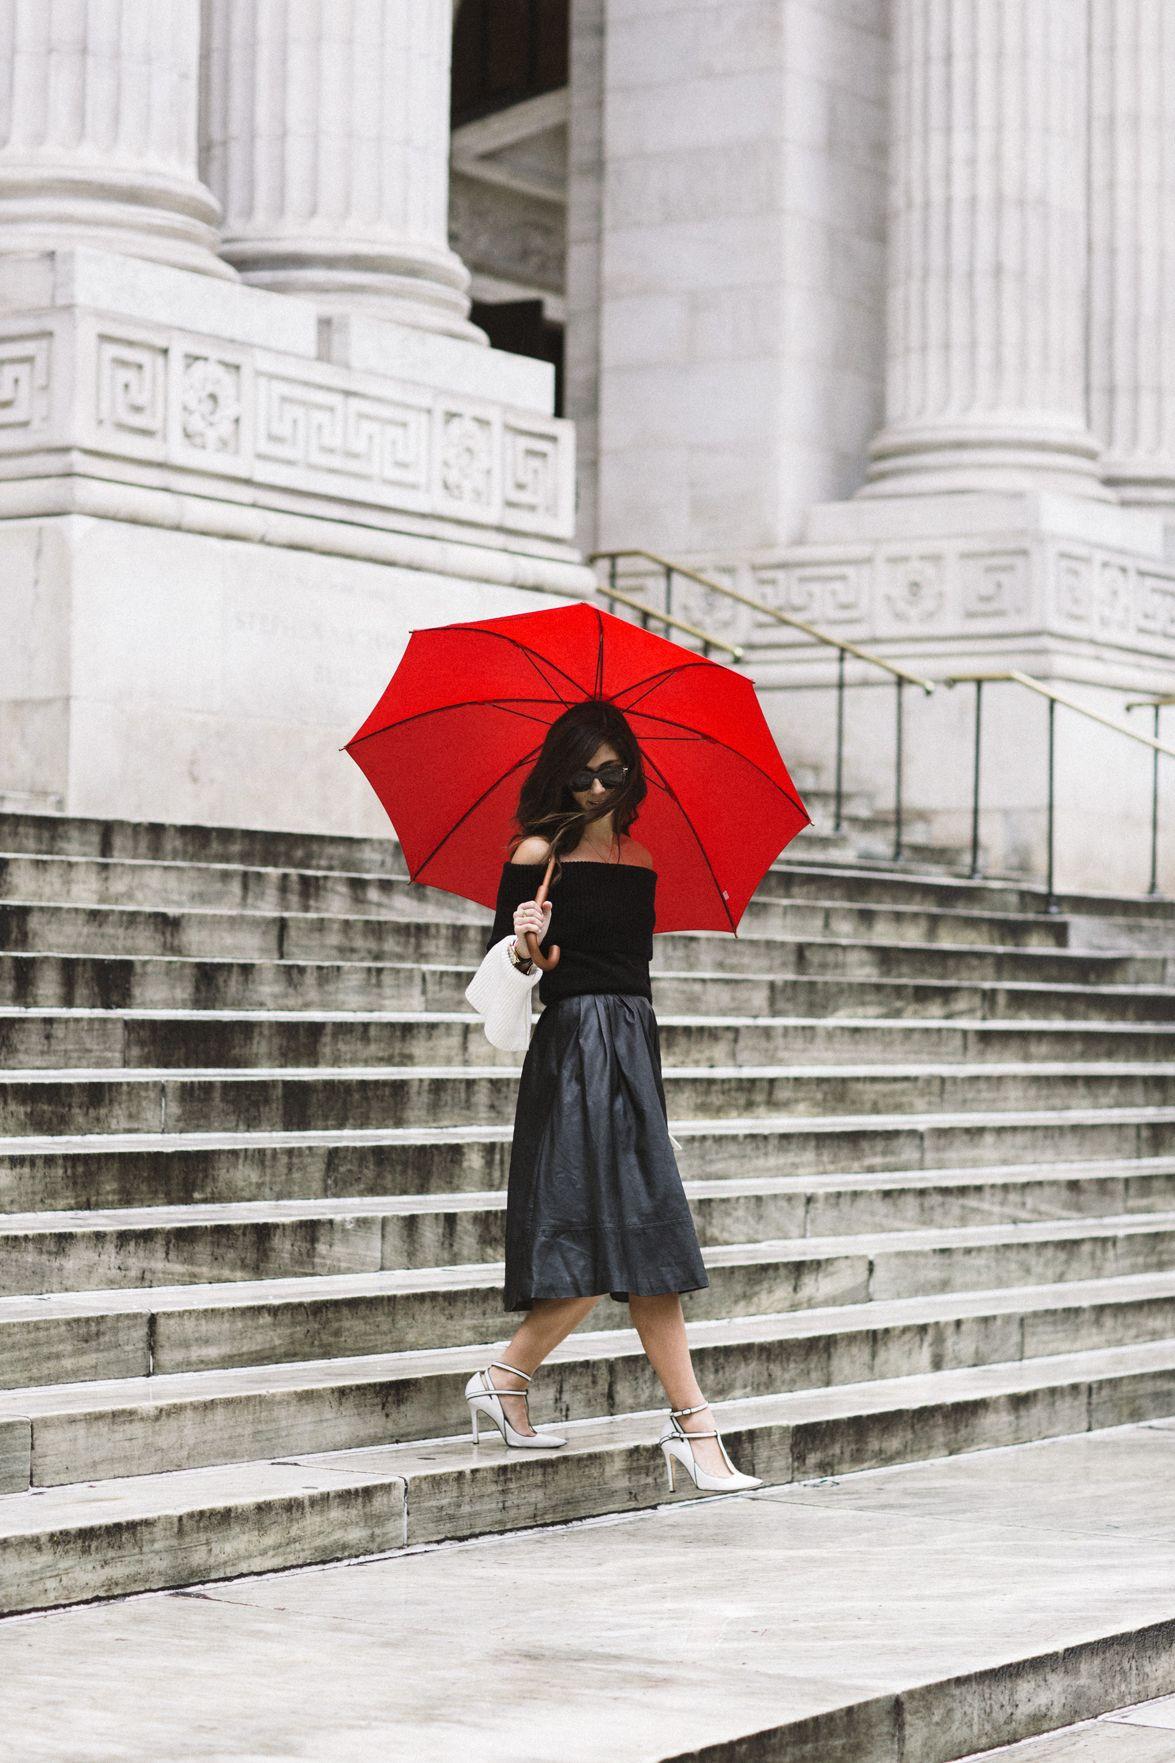 paris in the rain dream closet pinterest rain paris and how to wear. Black Bedroom Furniture Sets. Home Design Ideas